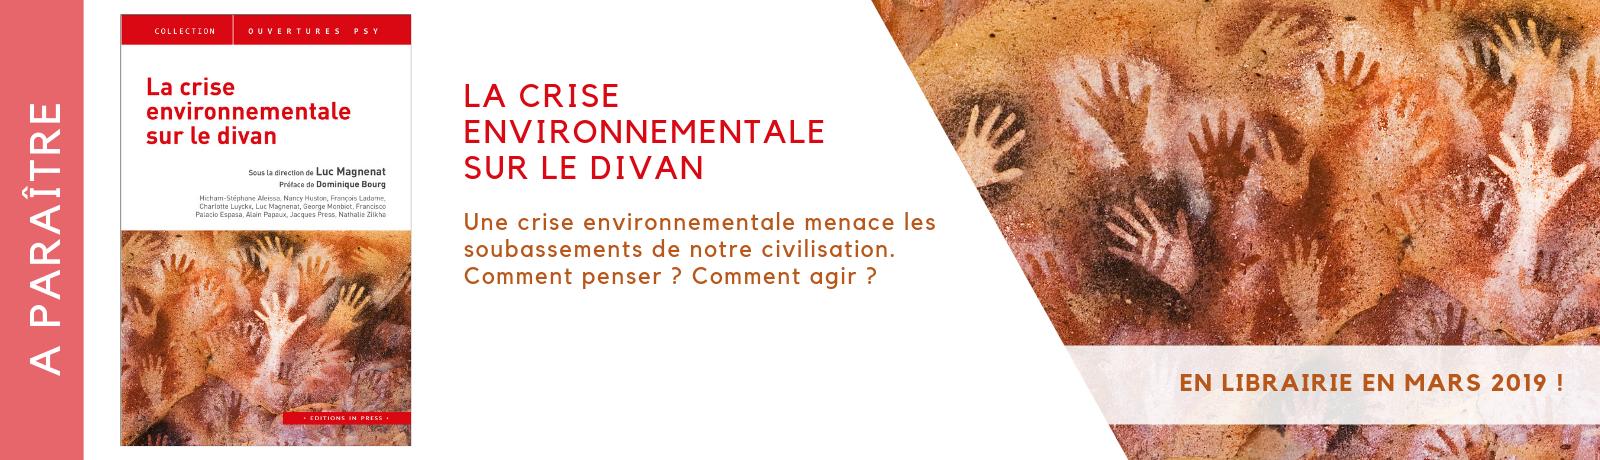 Ban environnement